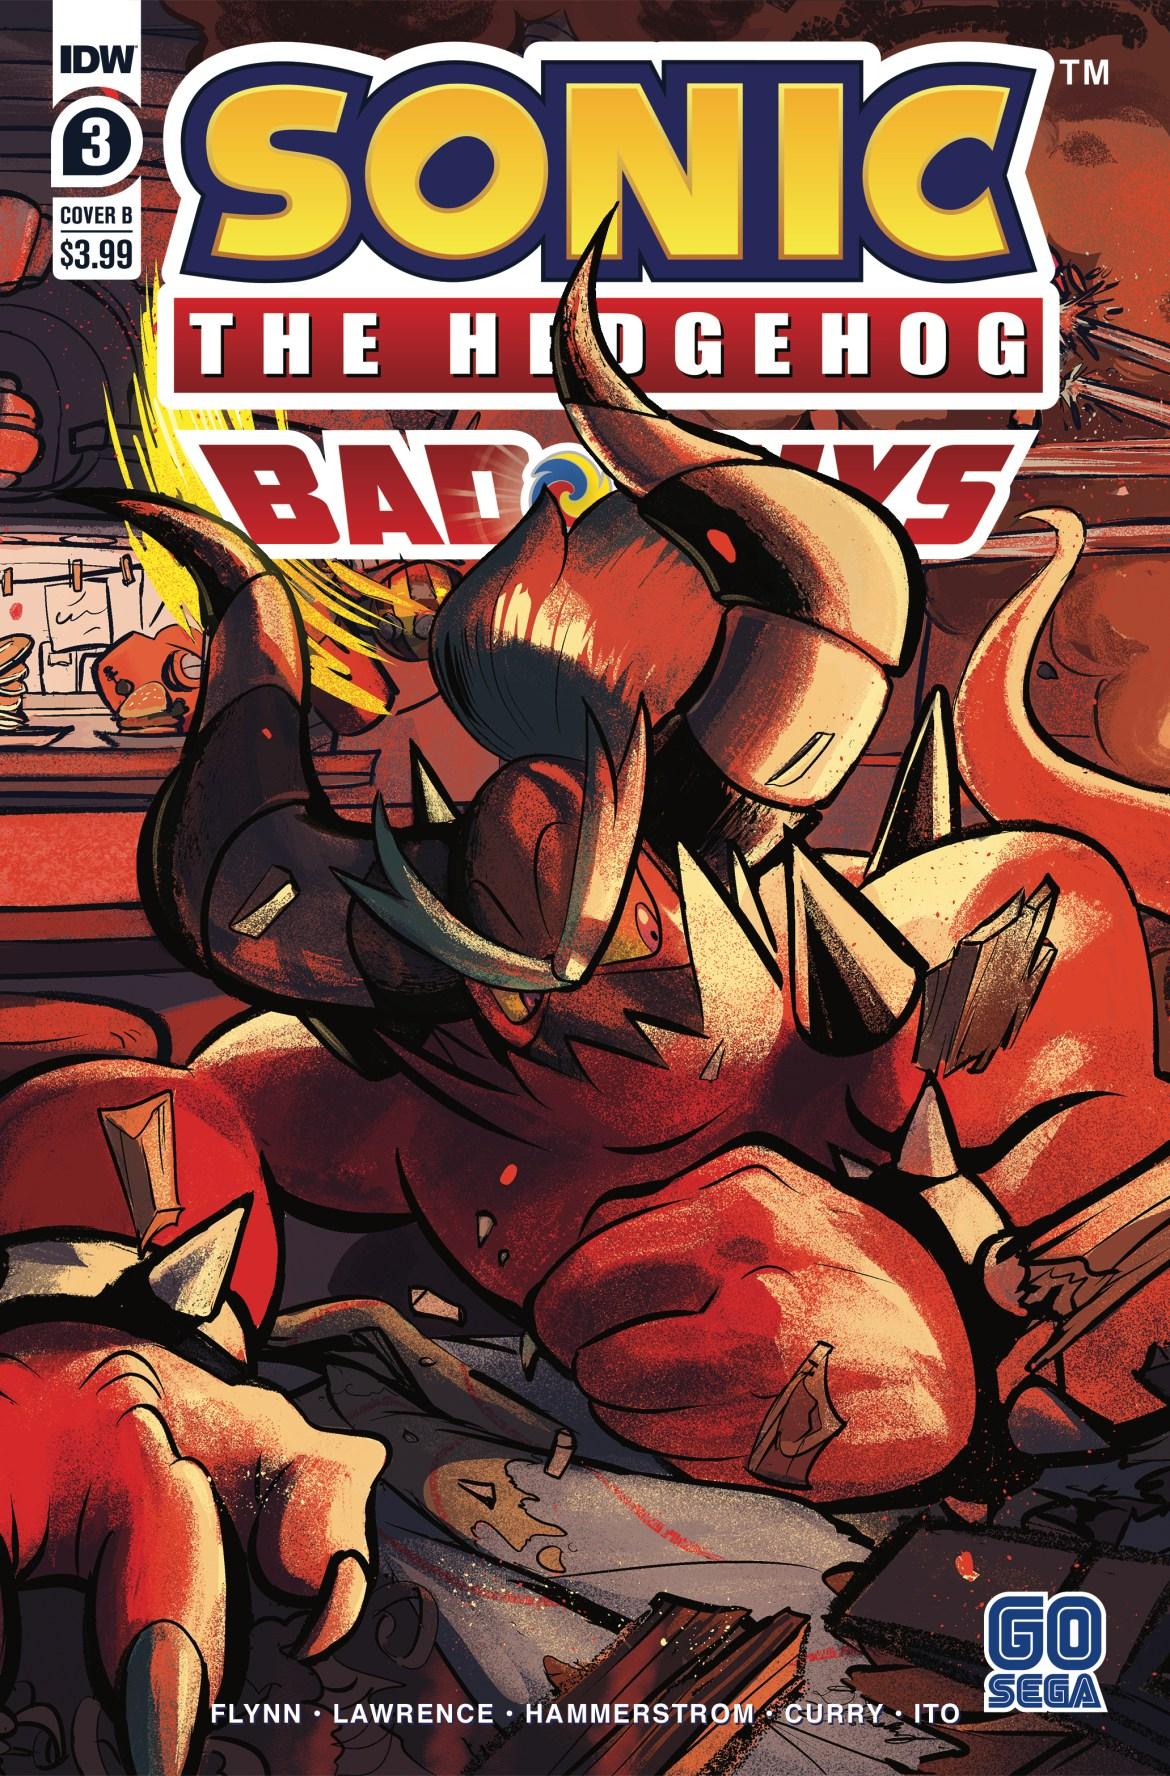 STH-BG03_cvrB ComicList Previews: SONIC THE HEDGEHOG BAD GUYS #3 (OF 4)